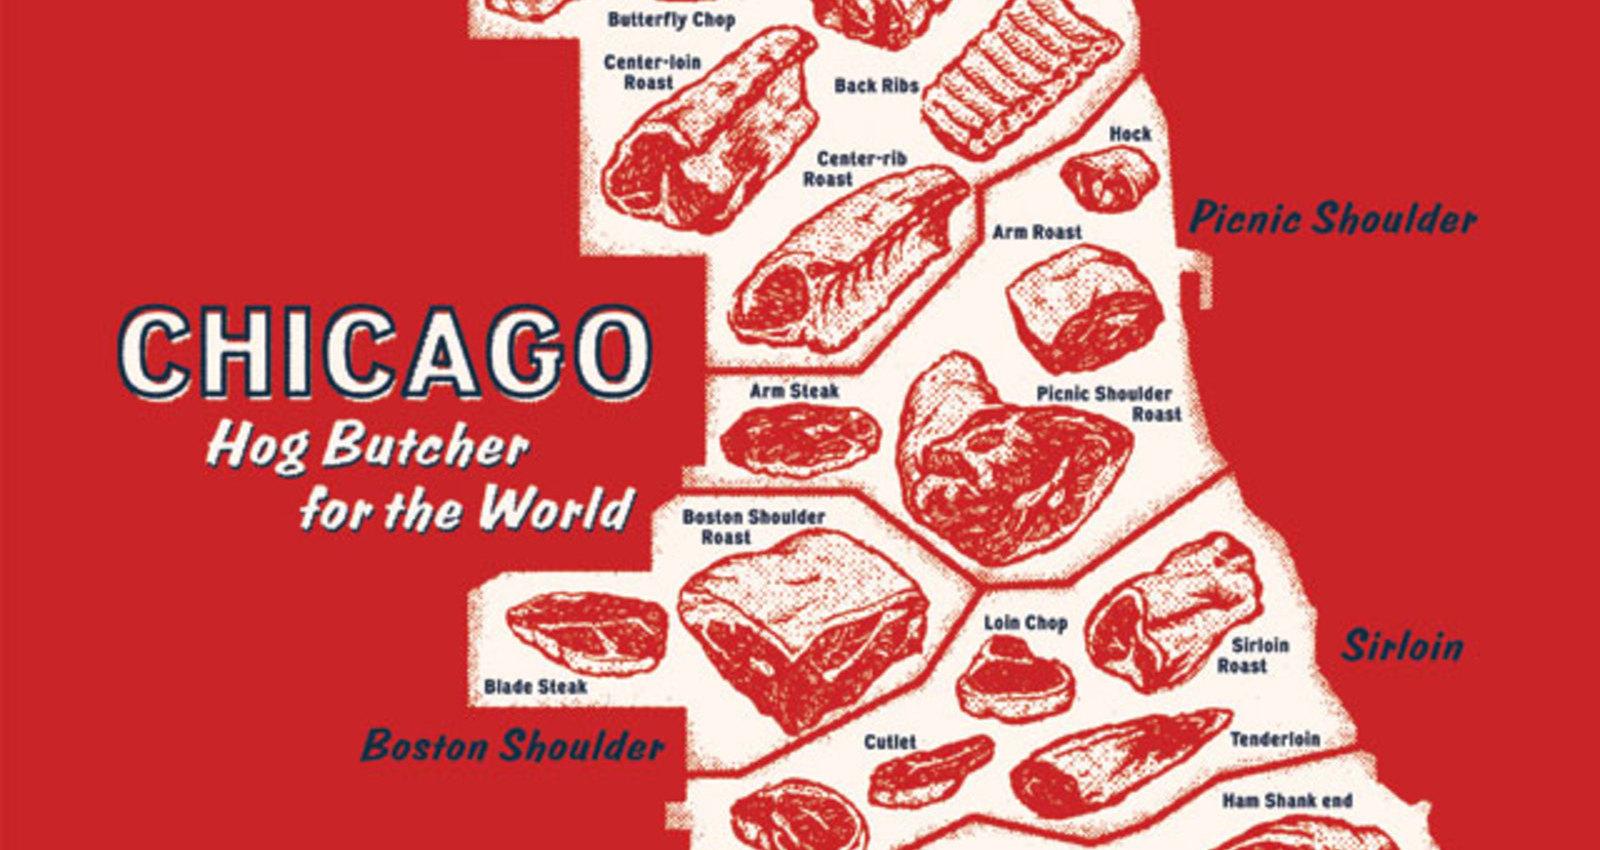 'Chicago'